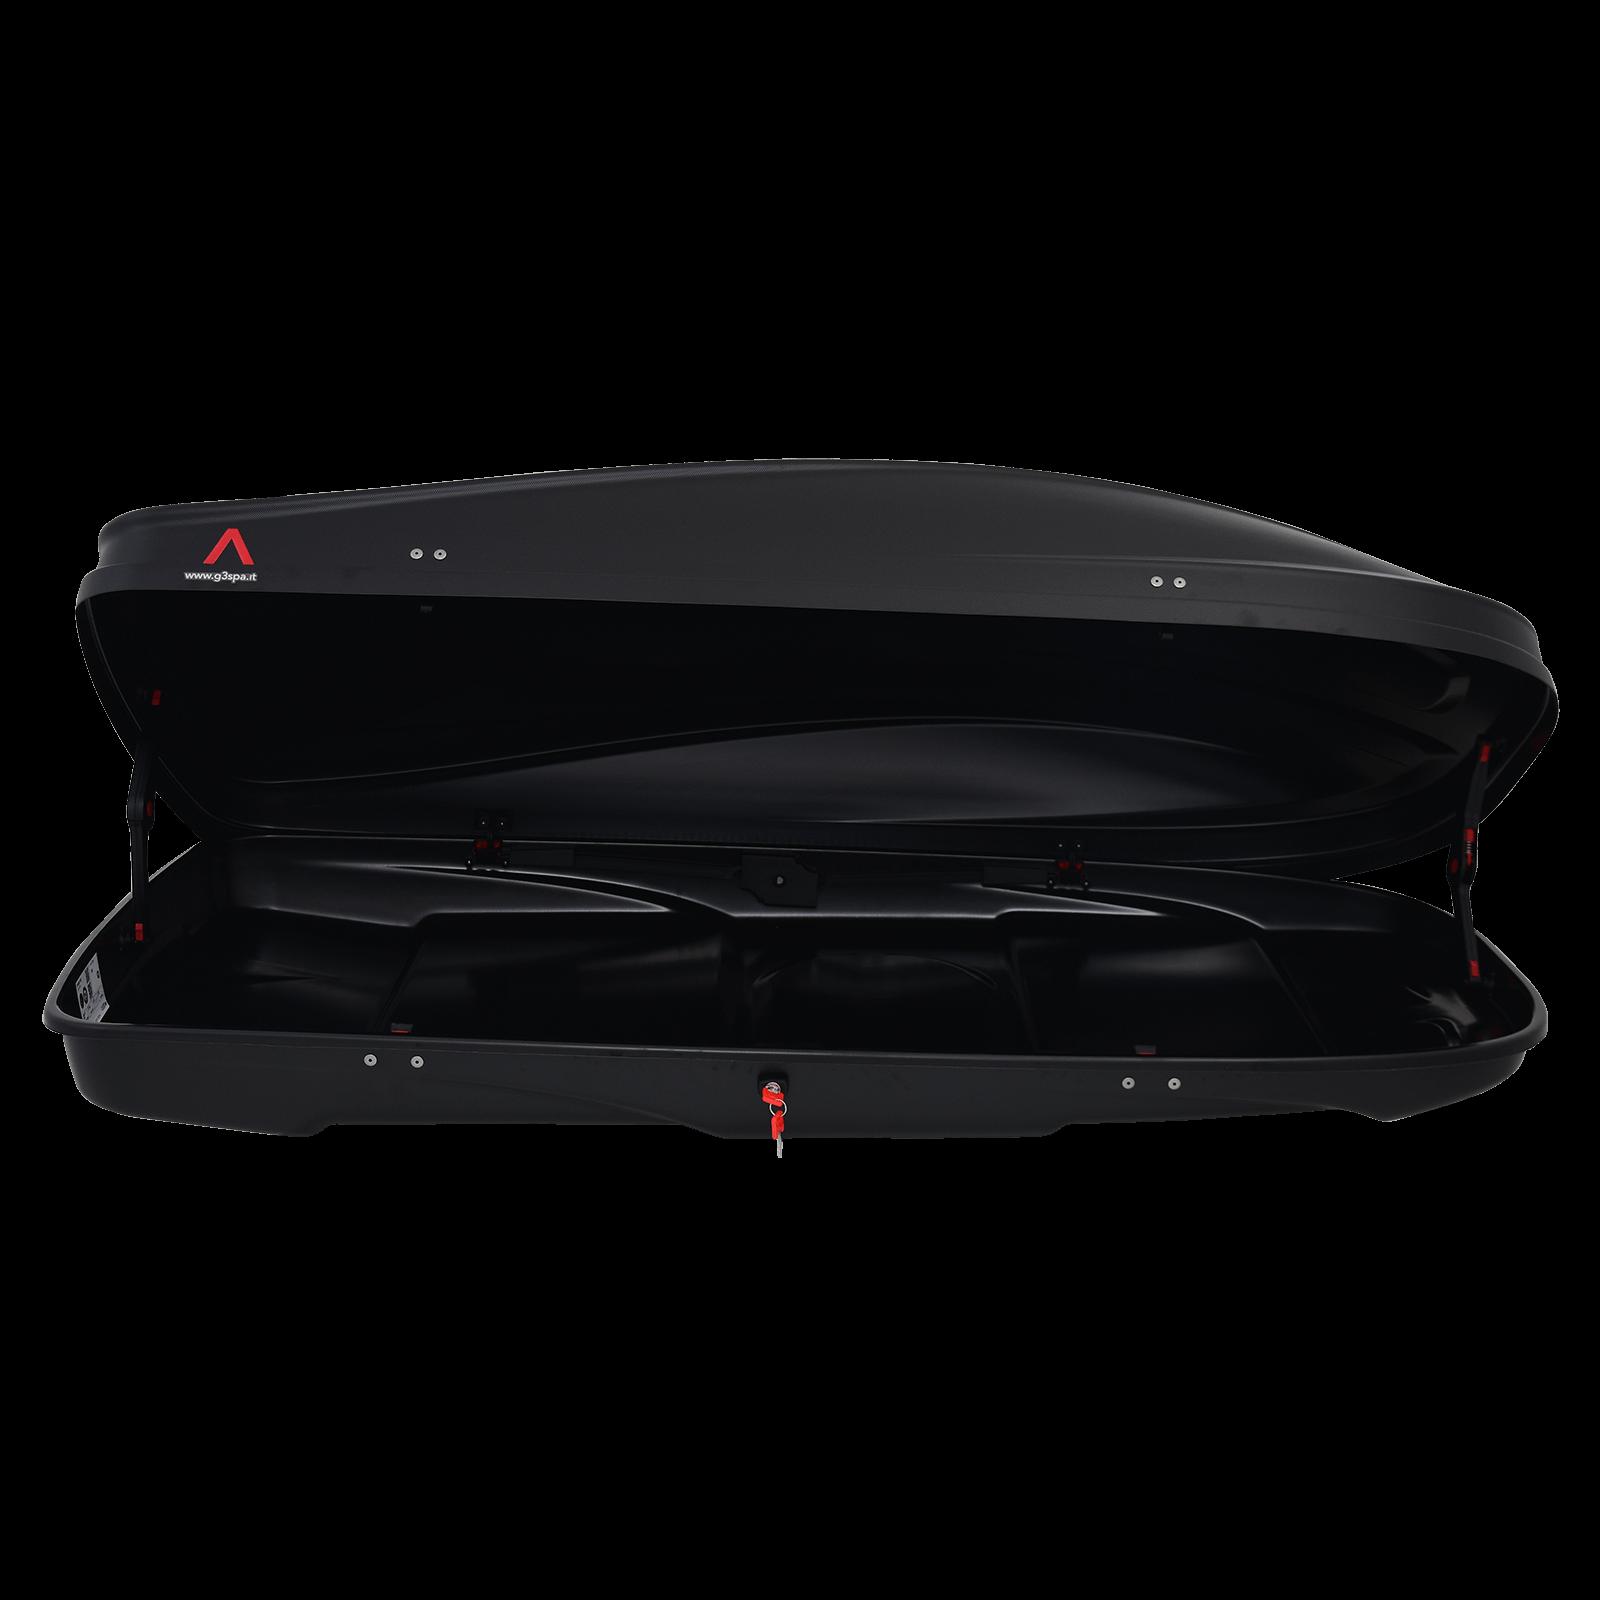 Dachbox G3 Spark 520 schwarz matt - Bild 2